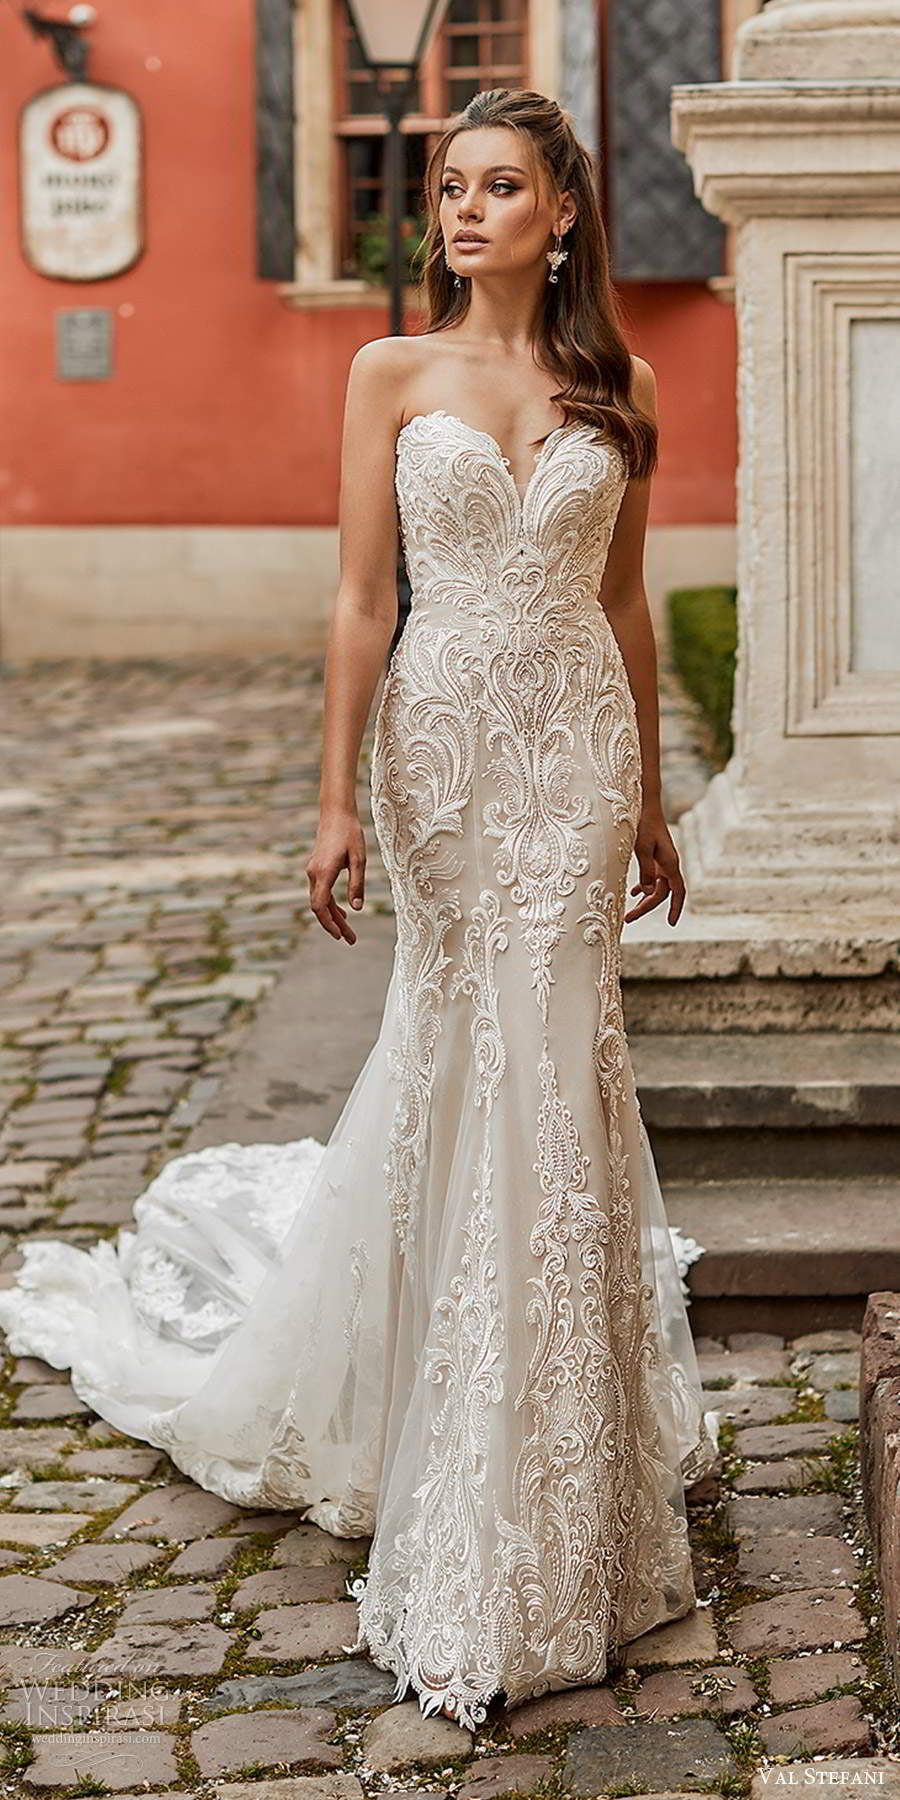 Val Stefani Spring 2021 Wedding Dresses Wedding Inspirasi Wedding Dress Trends Designer Bridal Gowns Beach Bridal Gown [ 1800 x 900 Pixel ]